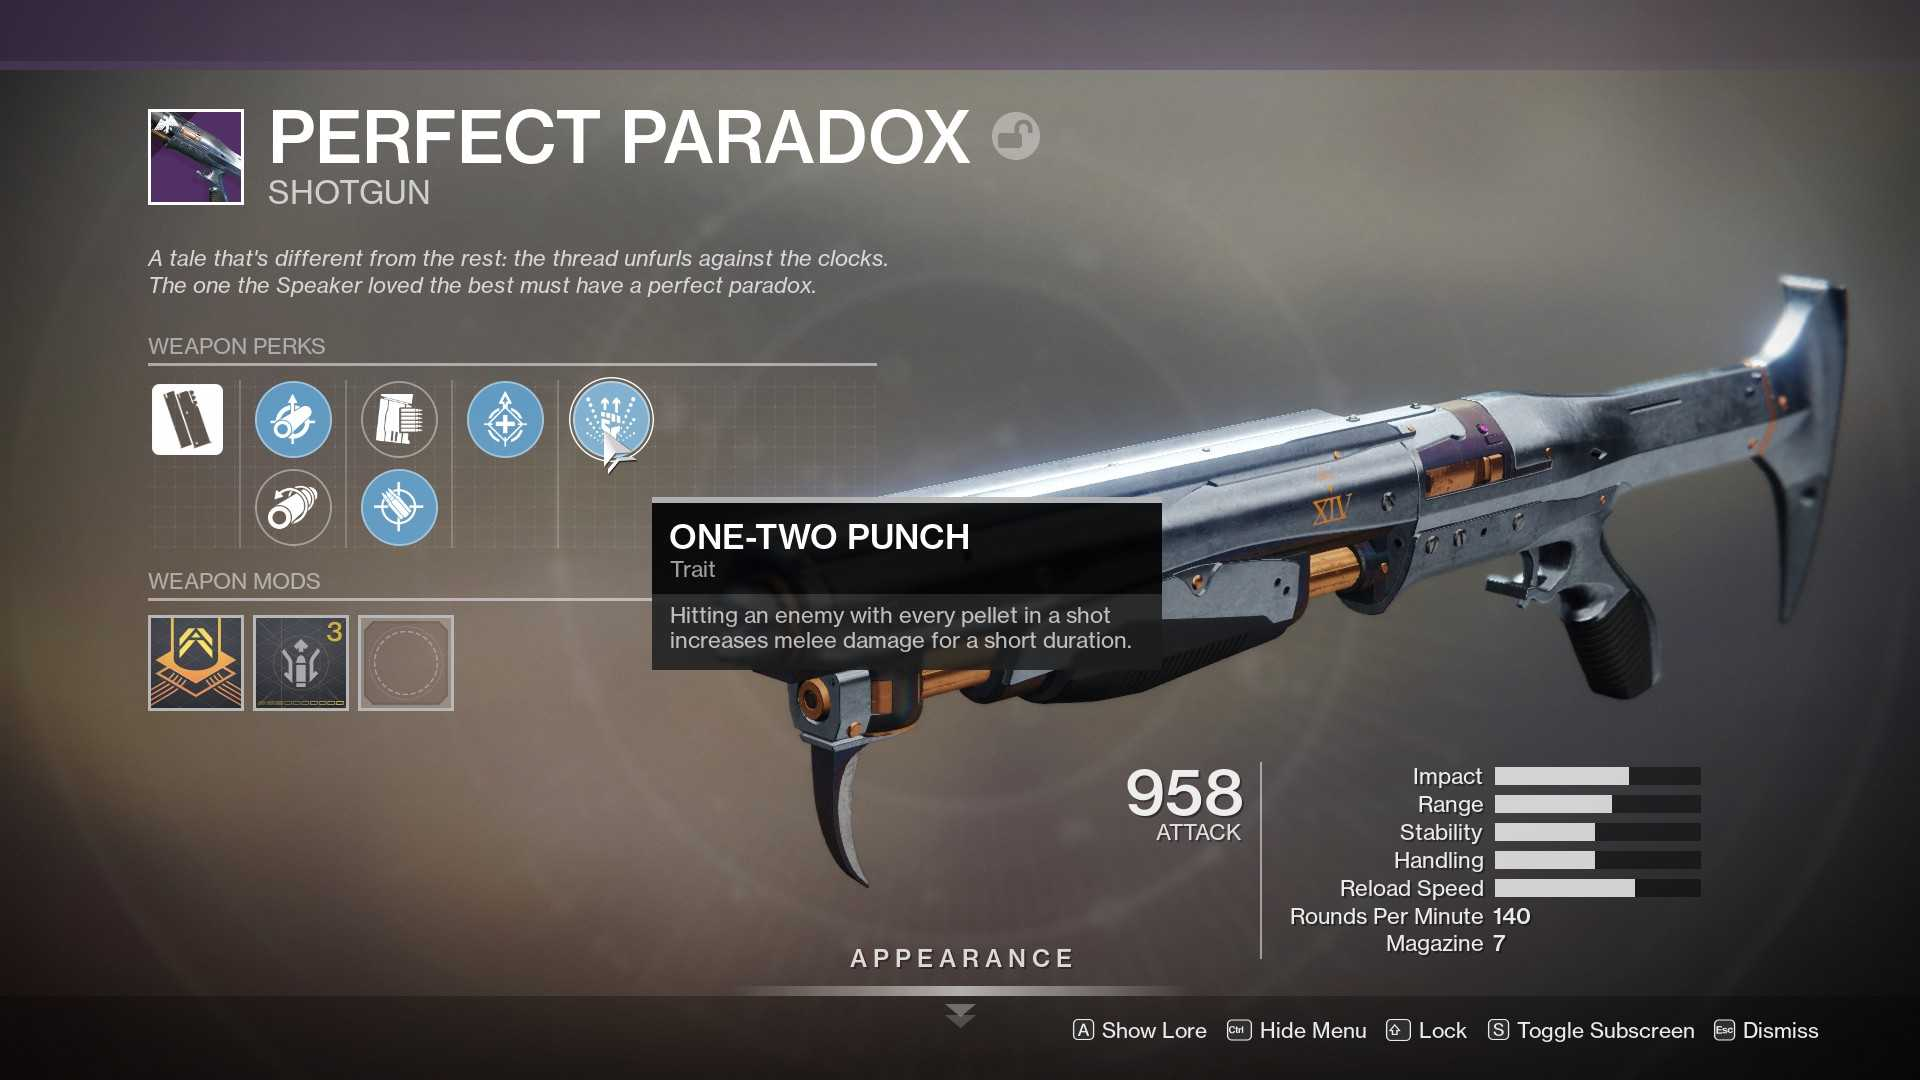 destiny 2 perfect paradox, destiny 2 perfect paradox god roll, god roll perfect paradox, perfect paradox god roll, perfect paradox god roll pvp, perfect paradox rolls